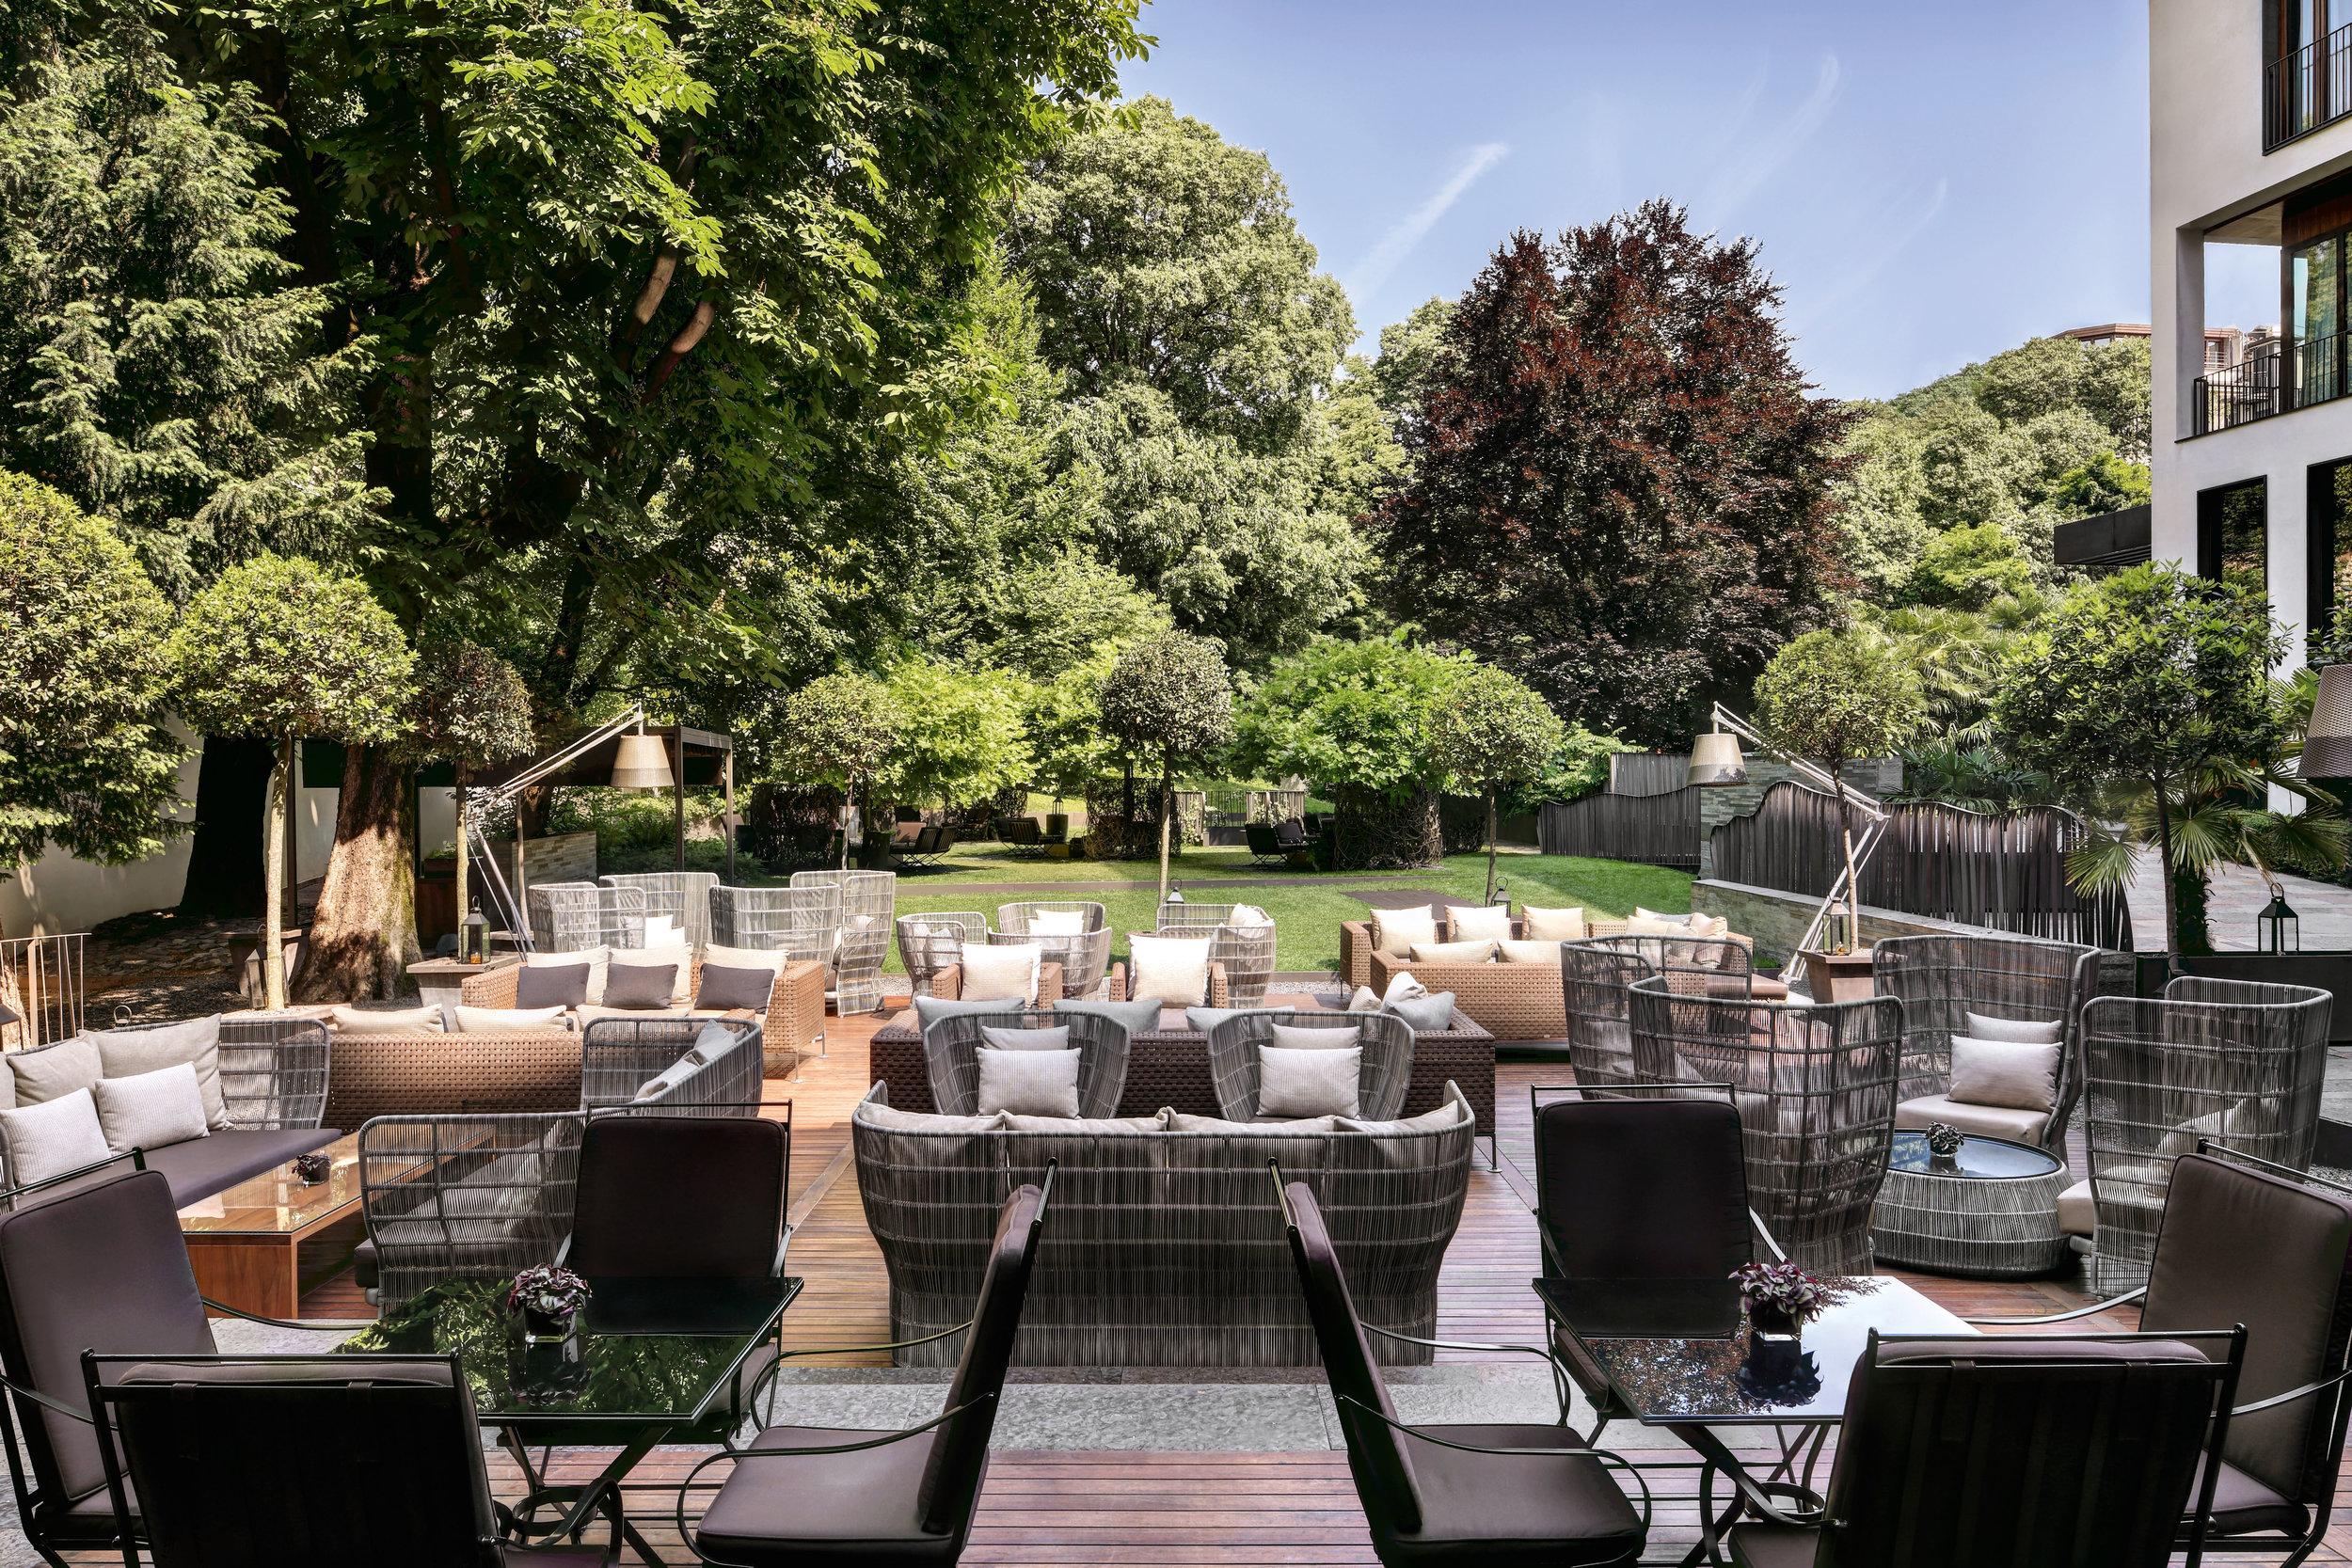 The garden at the Bulgari hotel